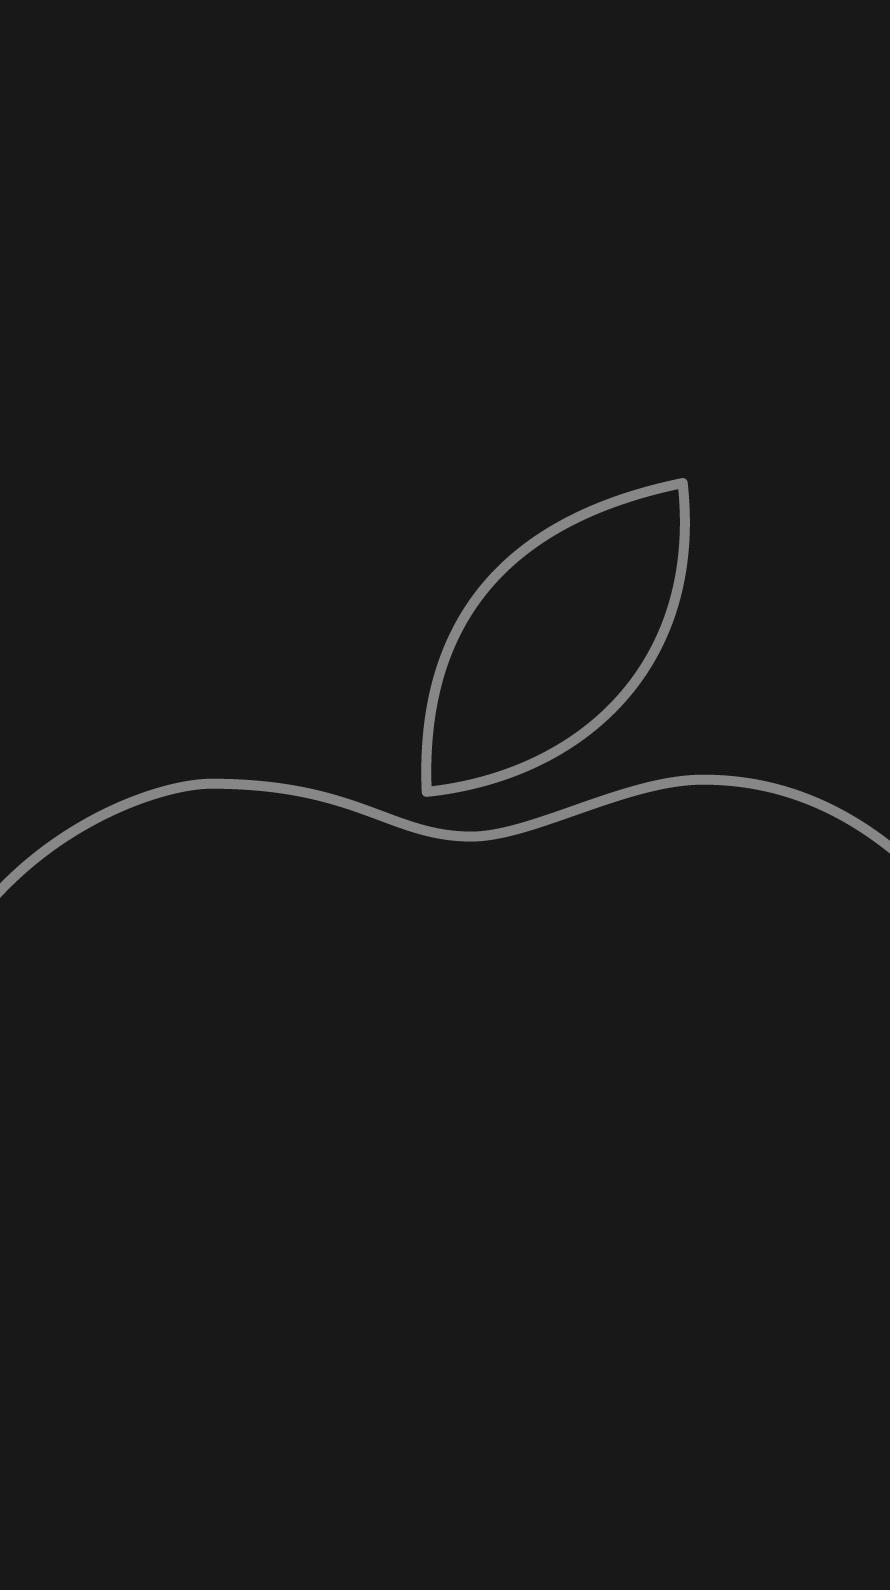 iPhone7, 6, 5用壁紙 Appleロゴ モノクロ 3